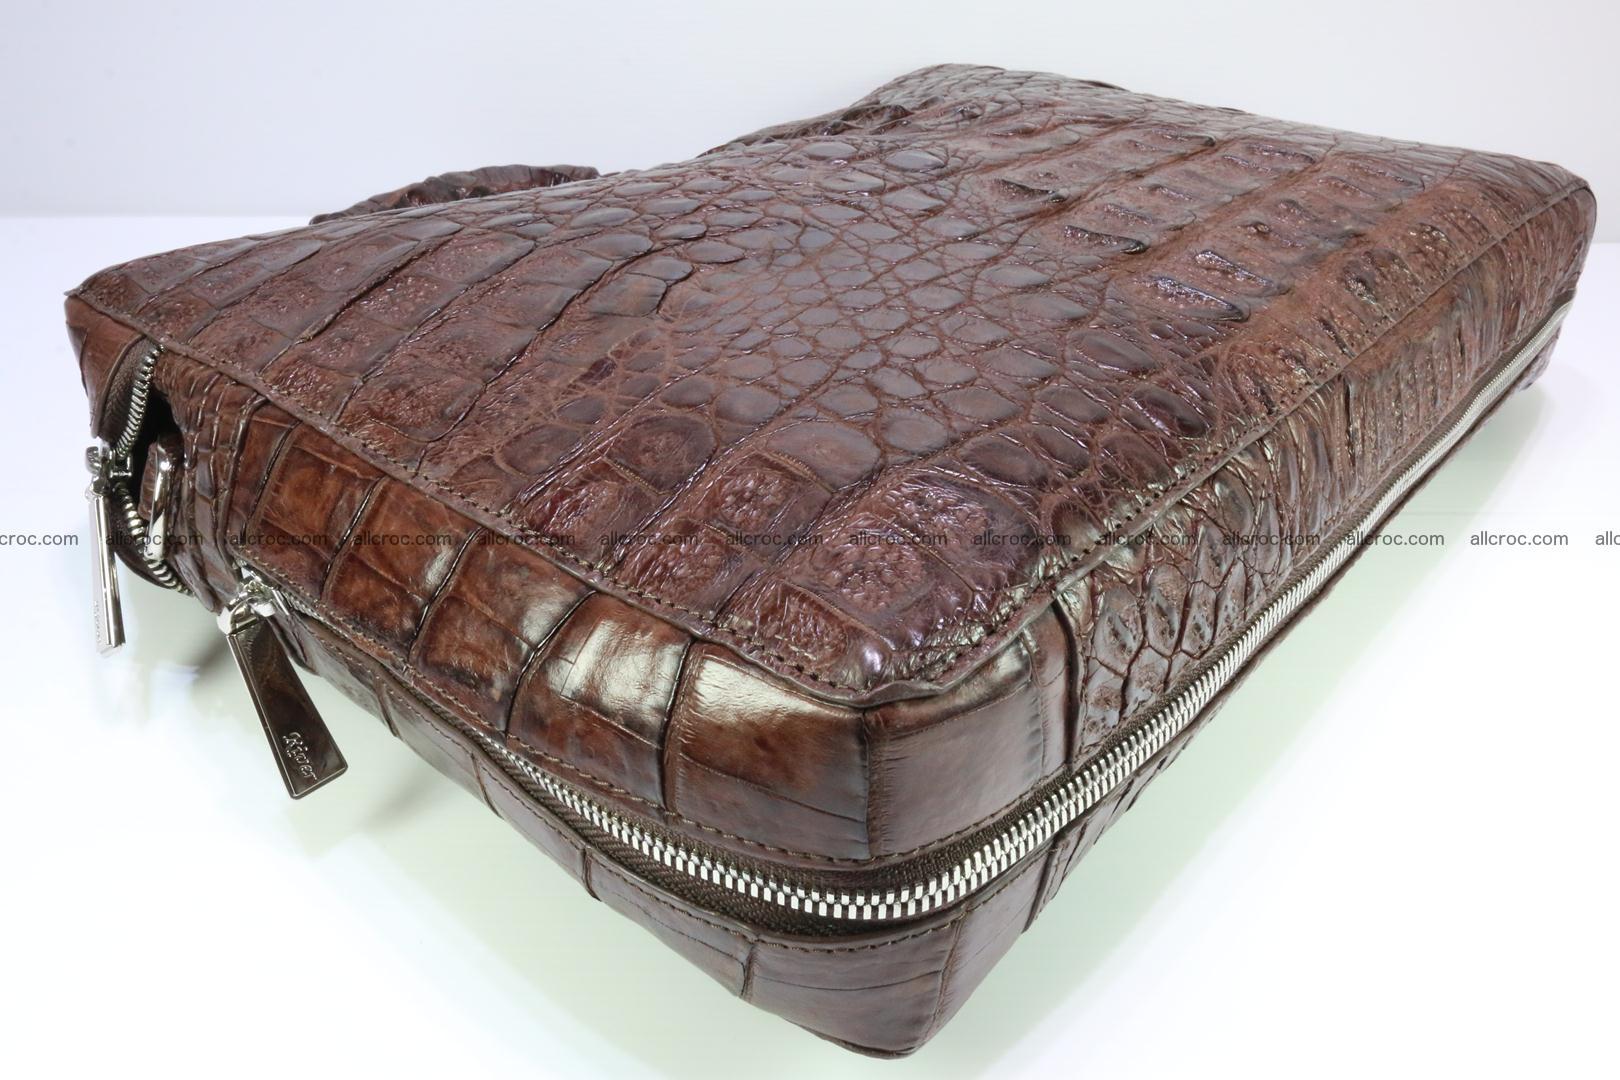 Crocodile skin handbag 126 Foto 10